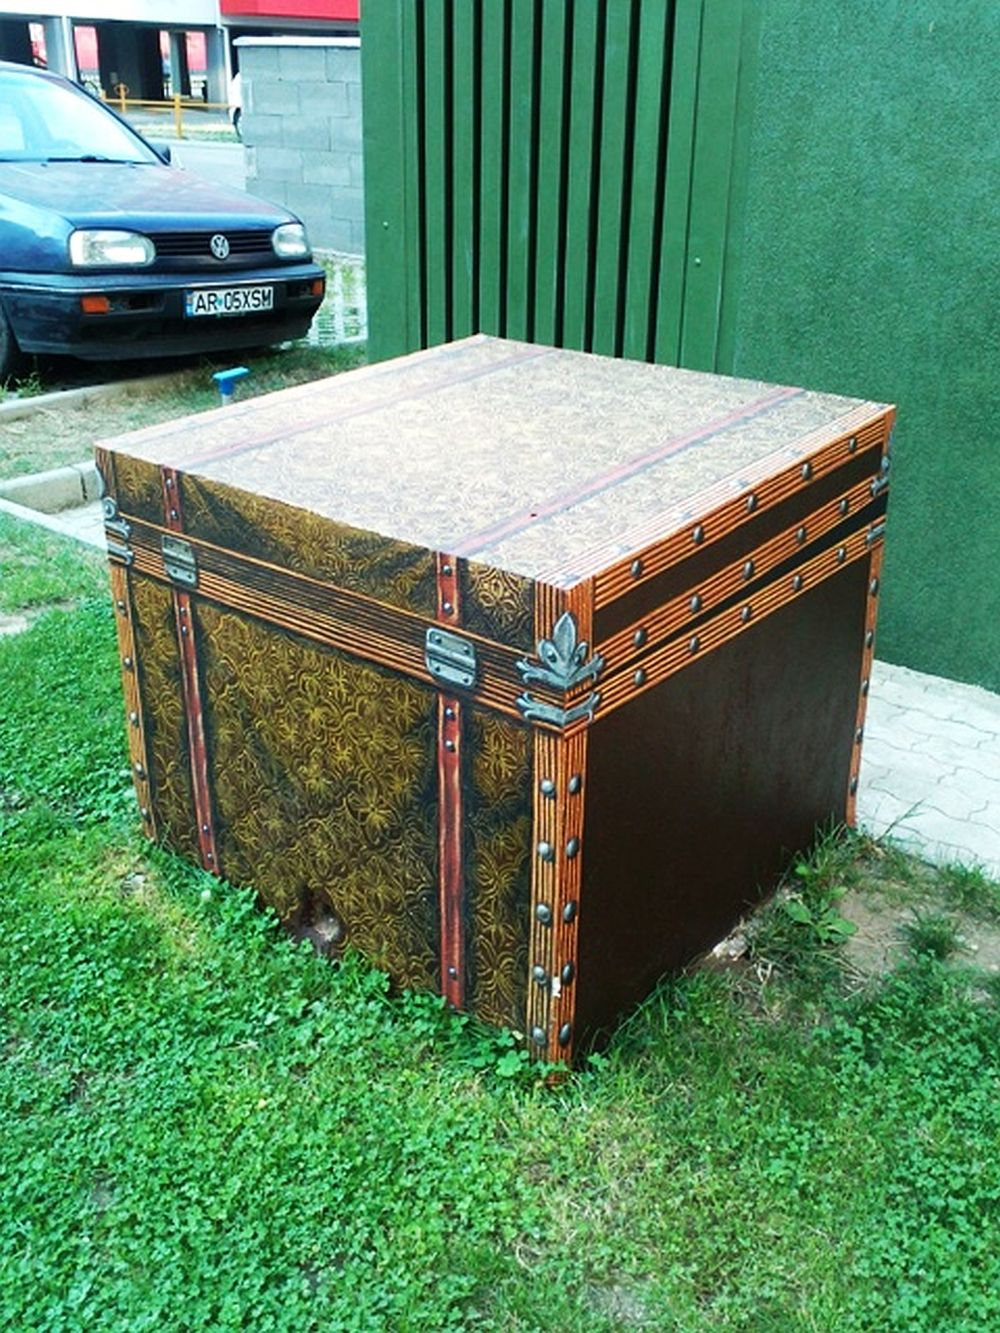 adelaparvu.com despre Sabin Chintoan si pictura urbana, Foto Sabin Chintoan (18)